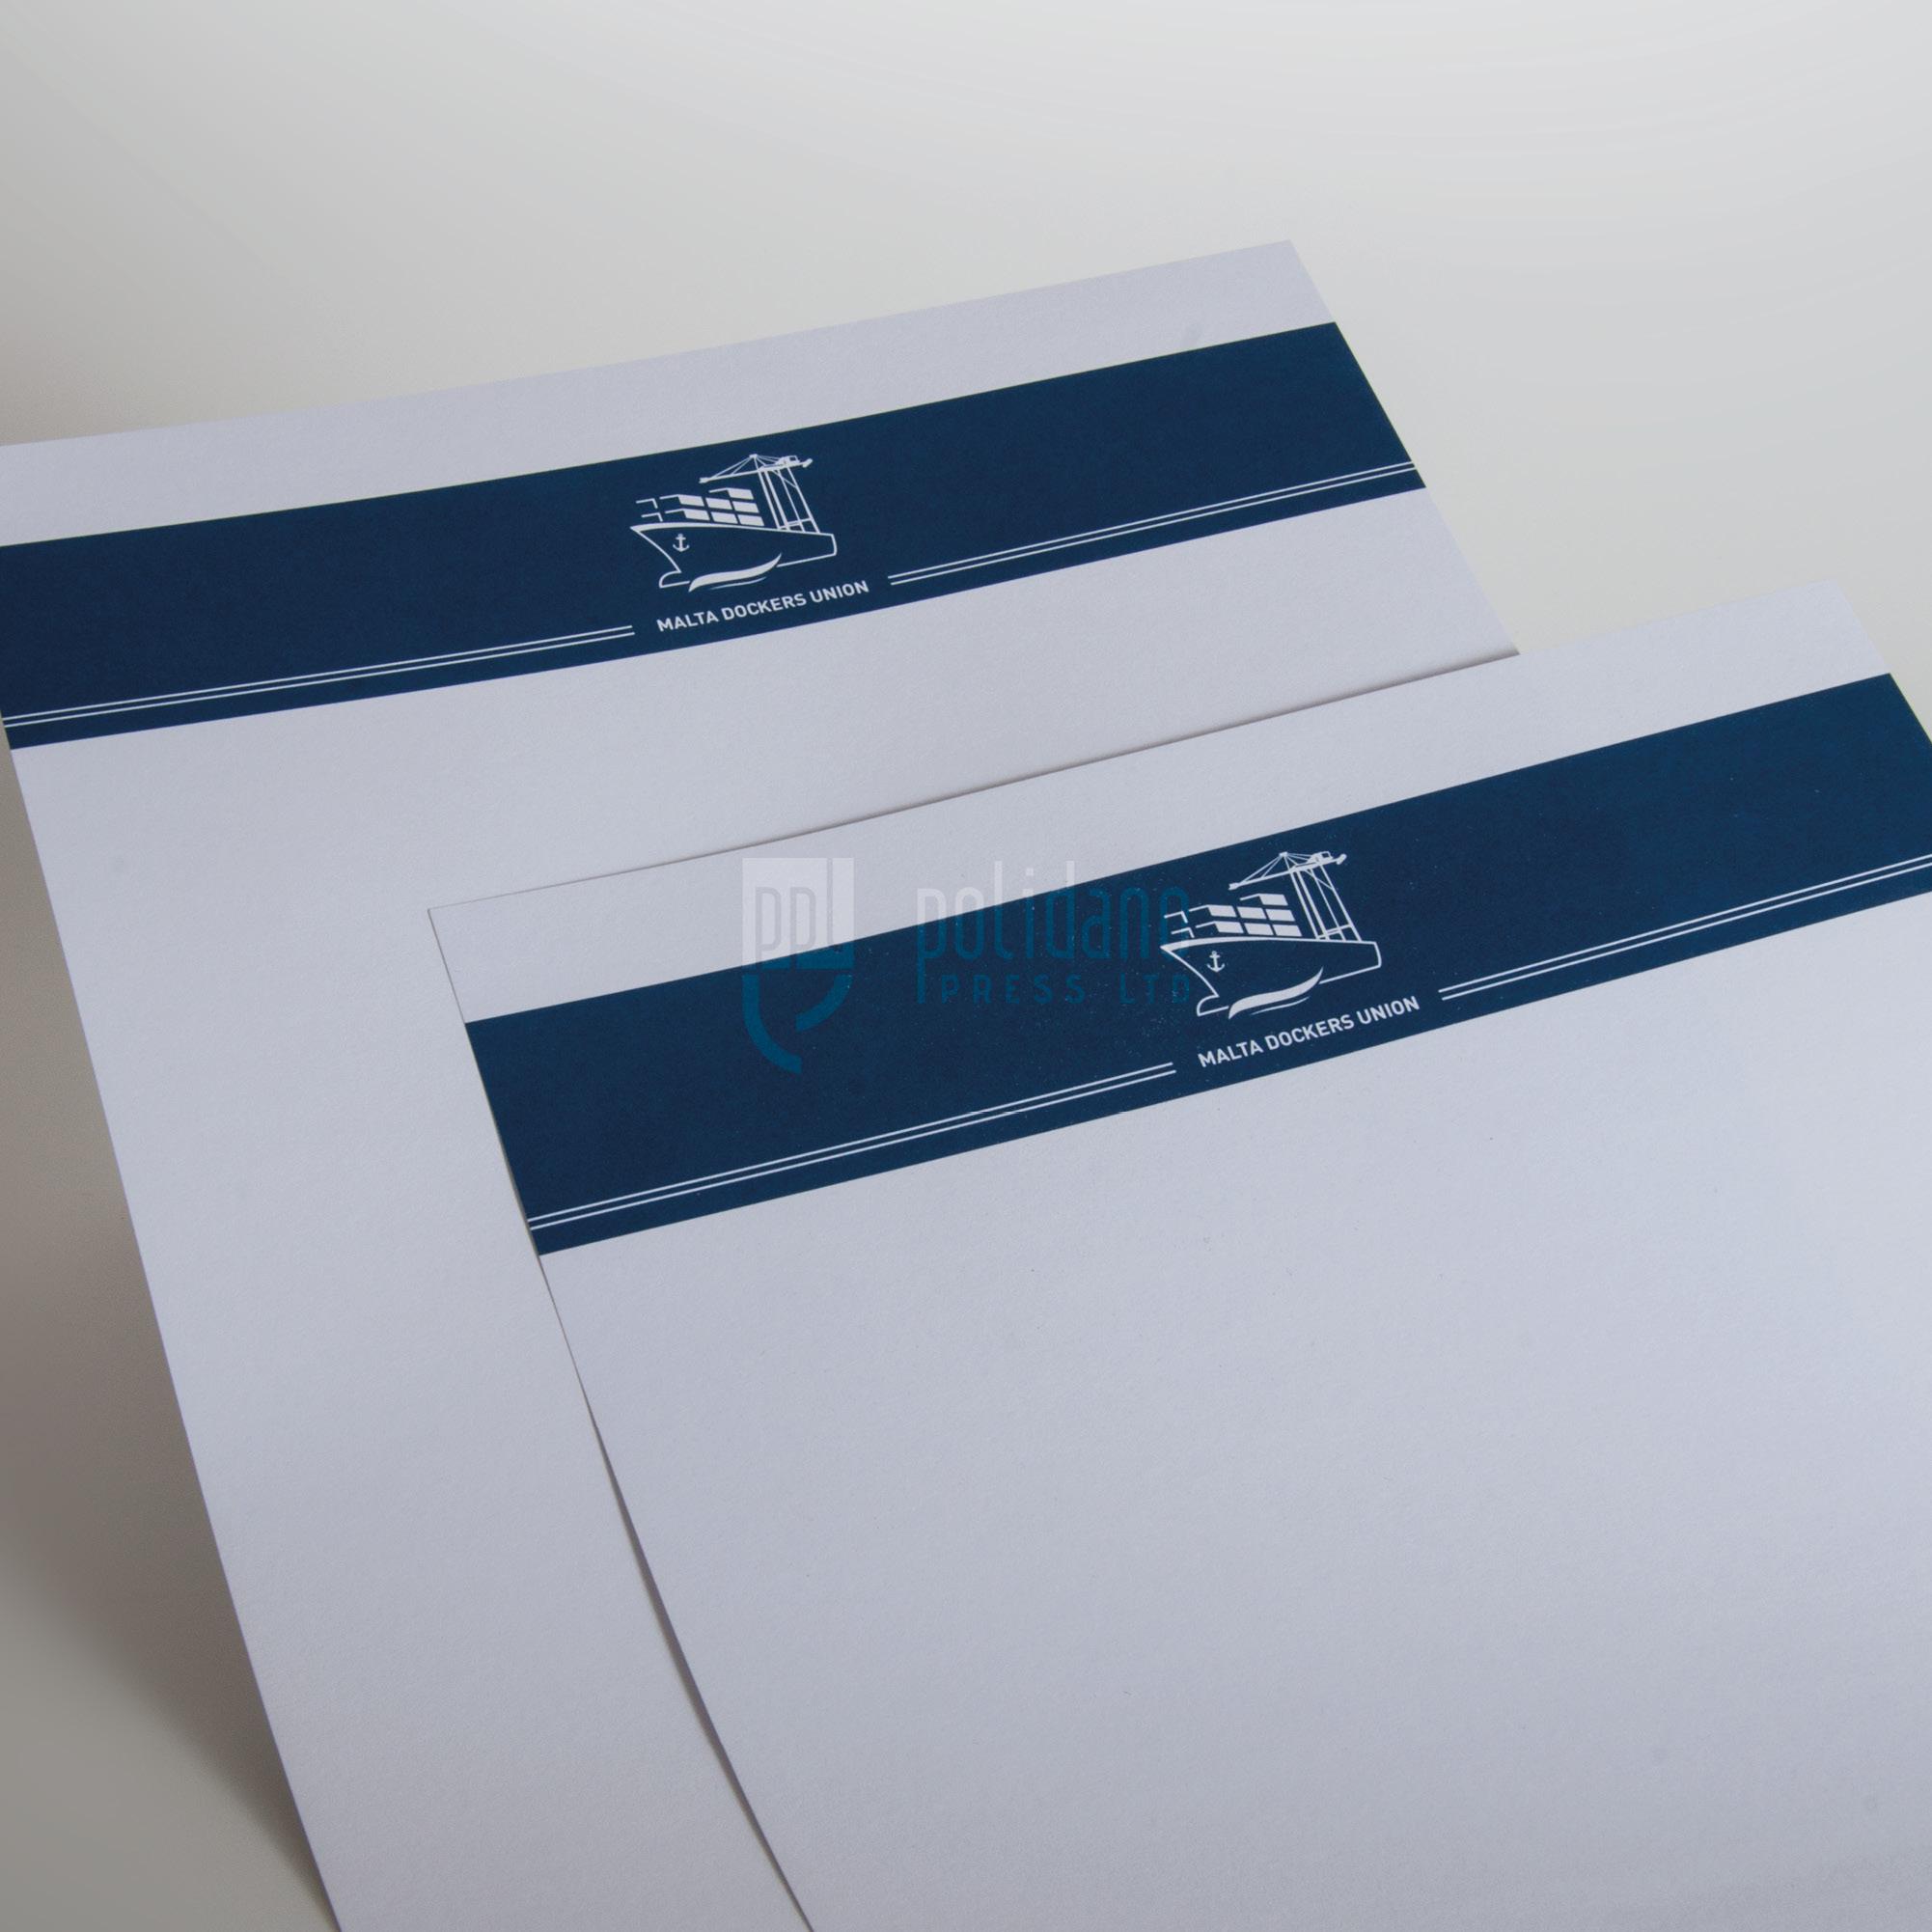 MDU letterheads